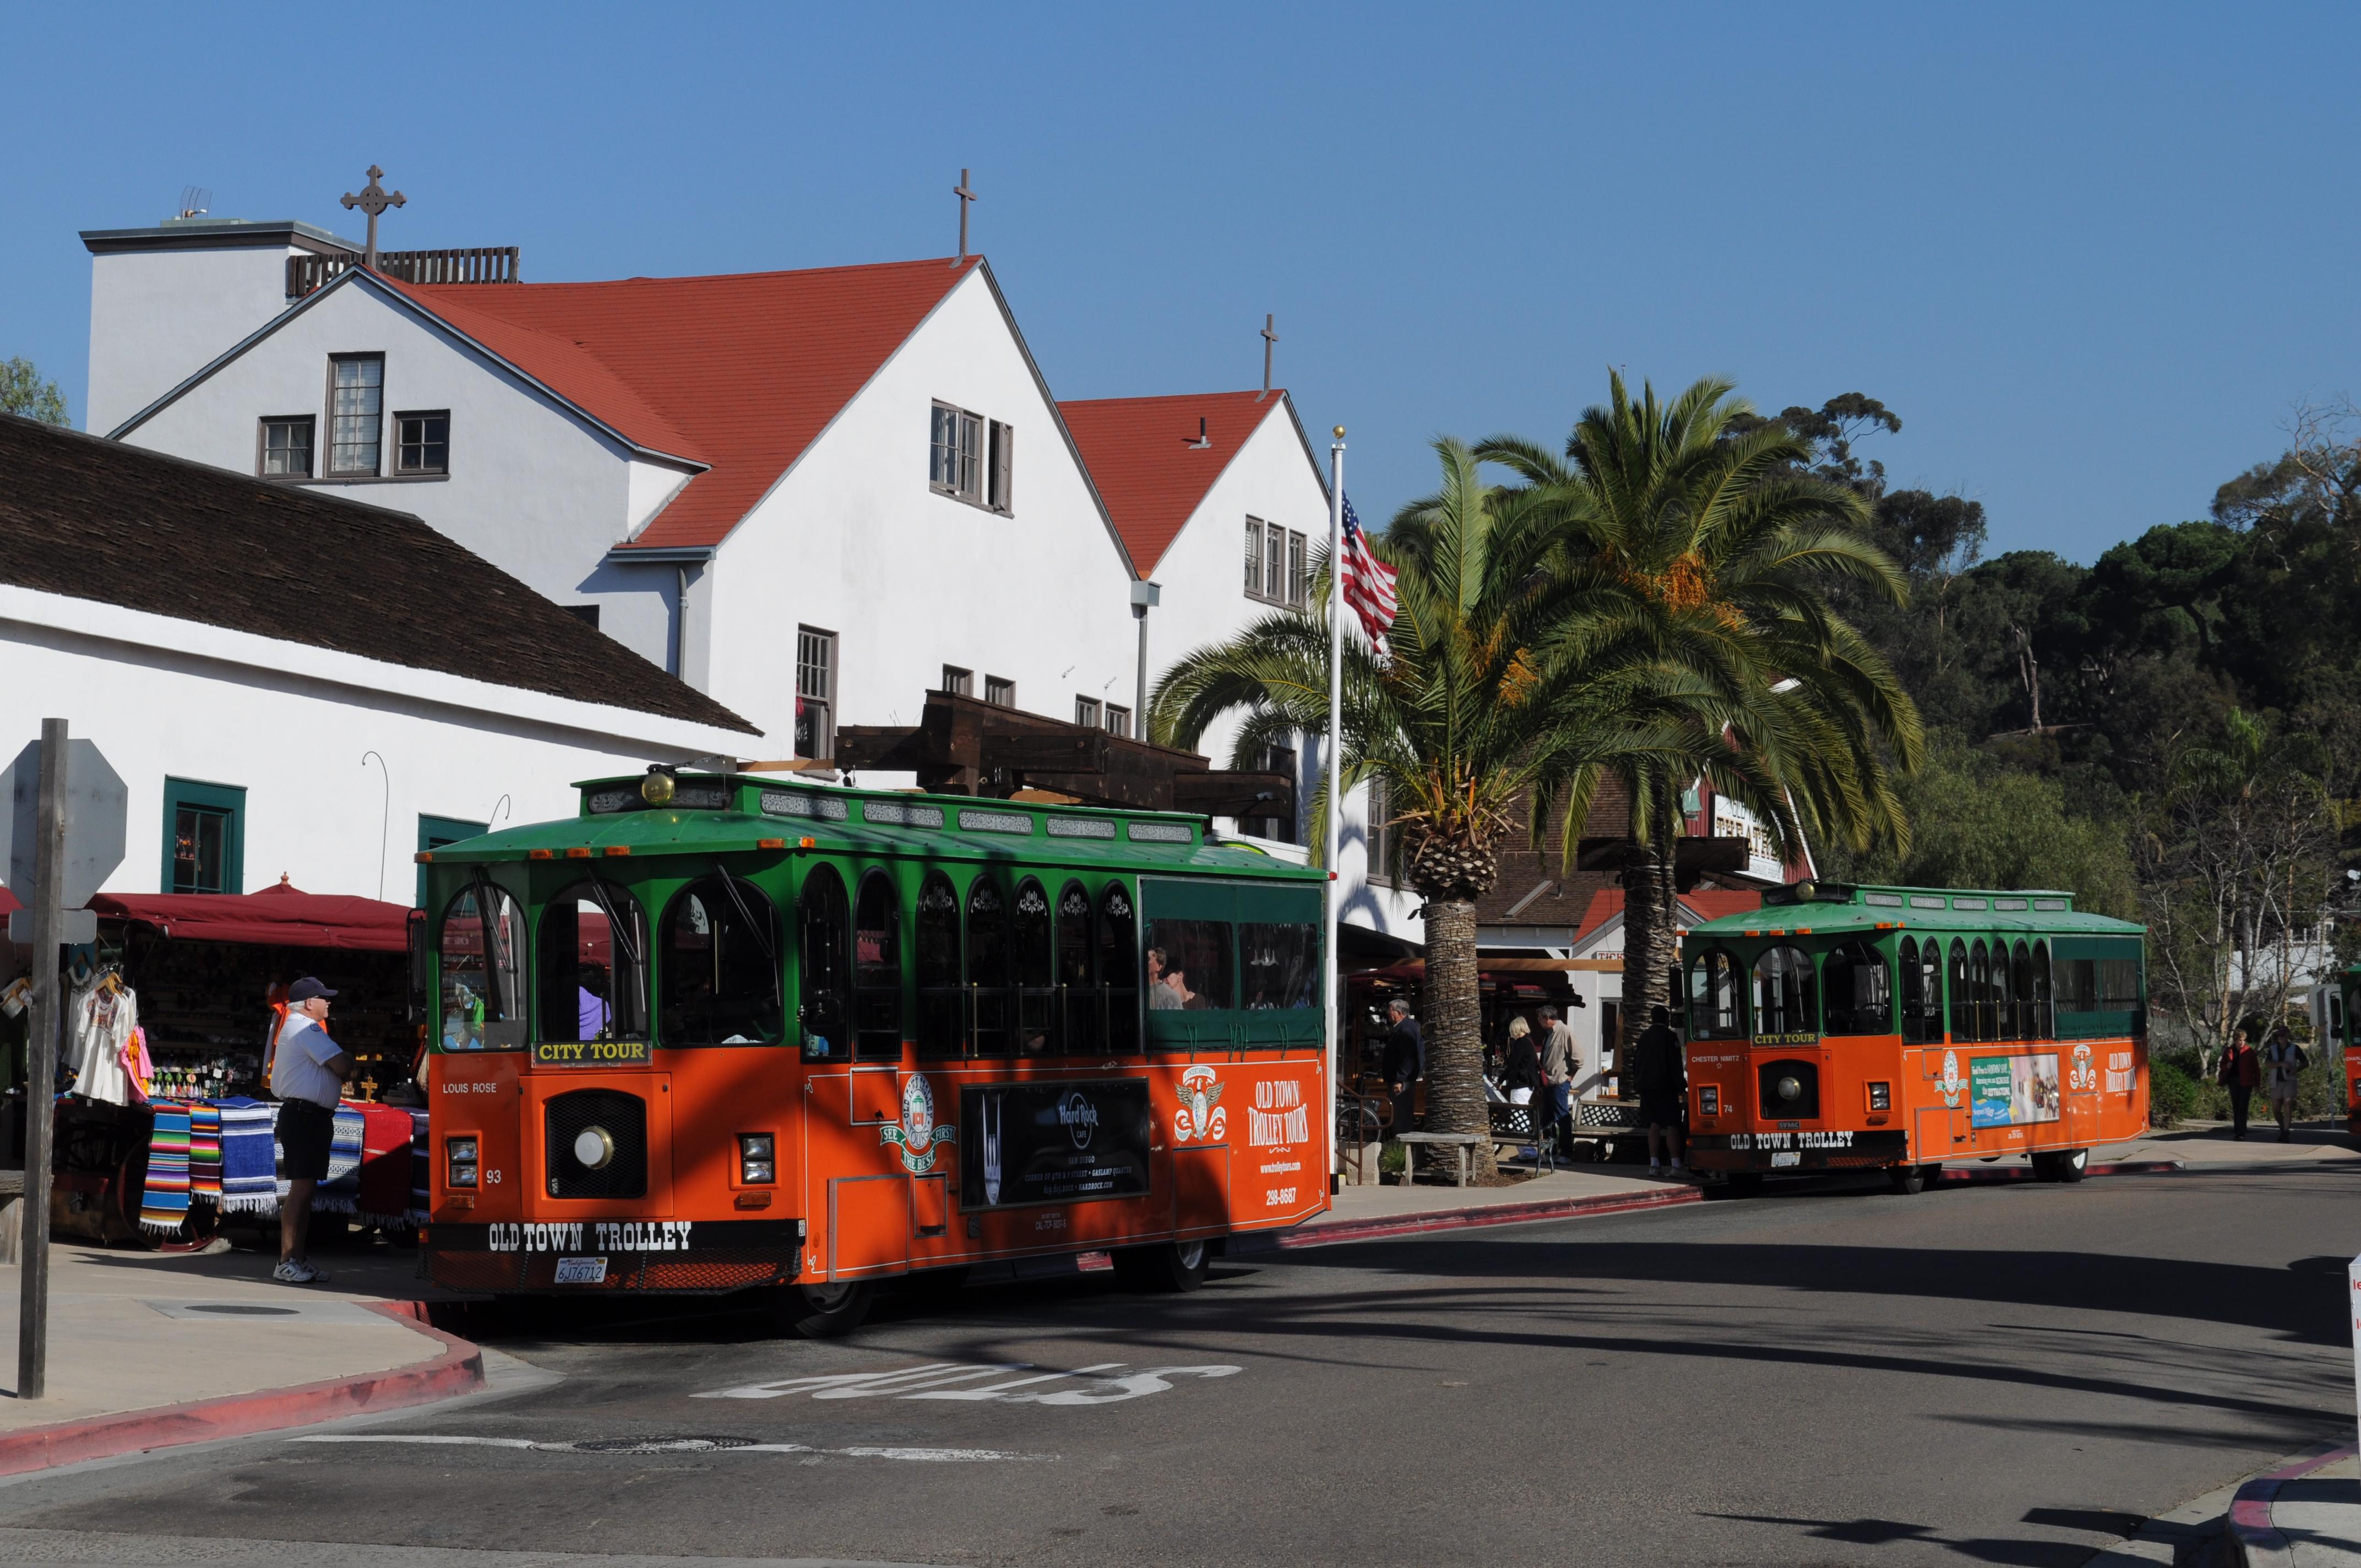 San_Diego_Old_Town_trolley